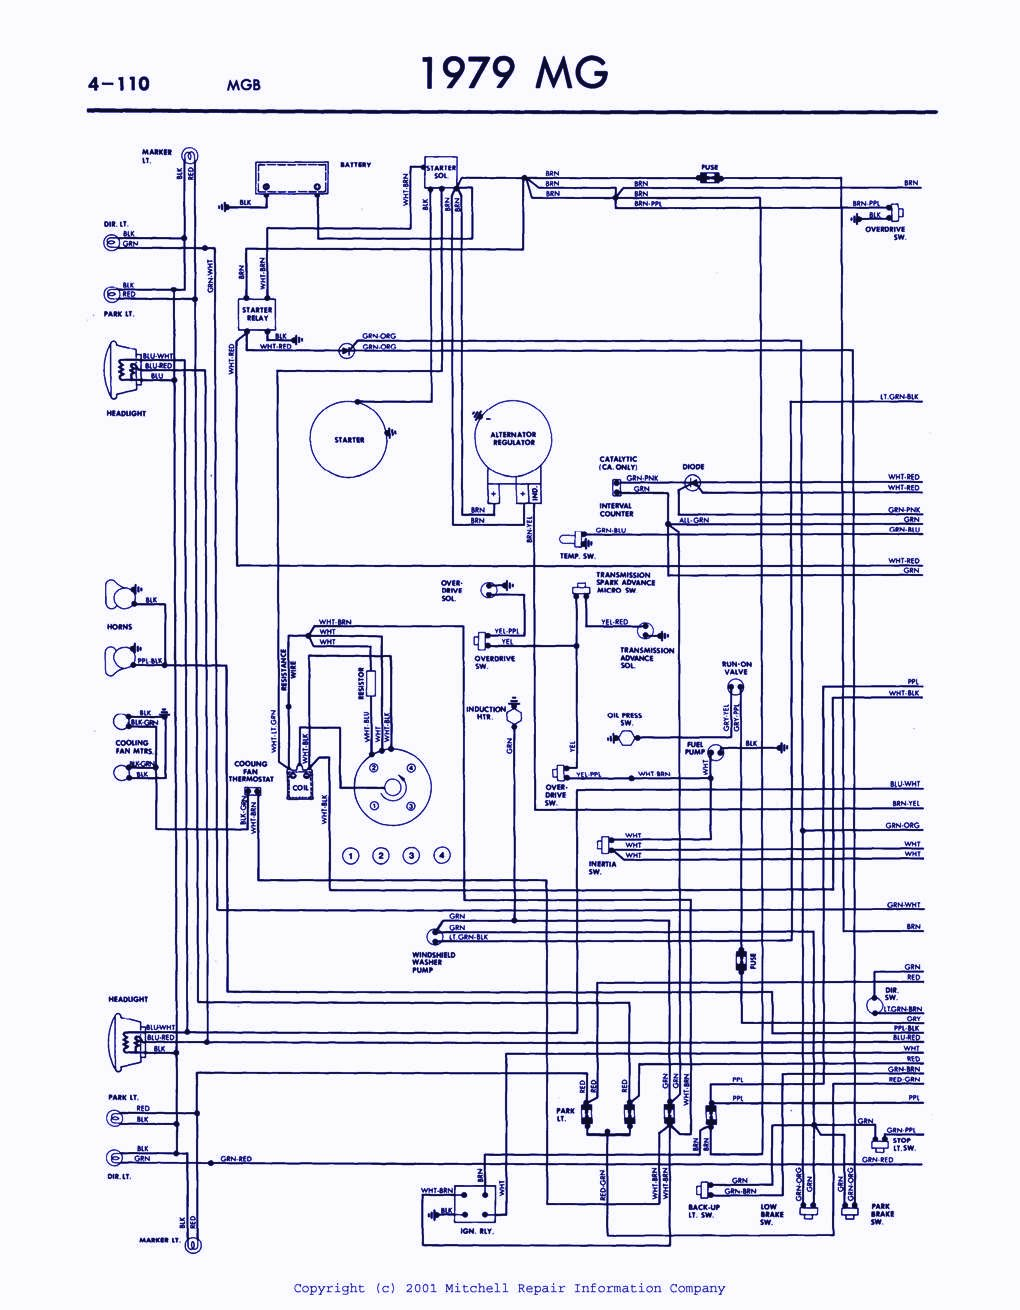 1979 MG MGB Wiring Diagram | Auto Wiring Diagrams